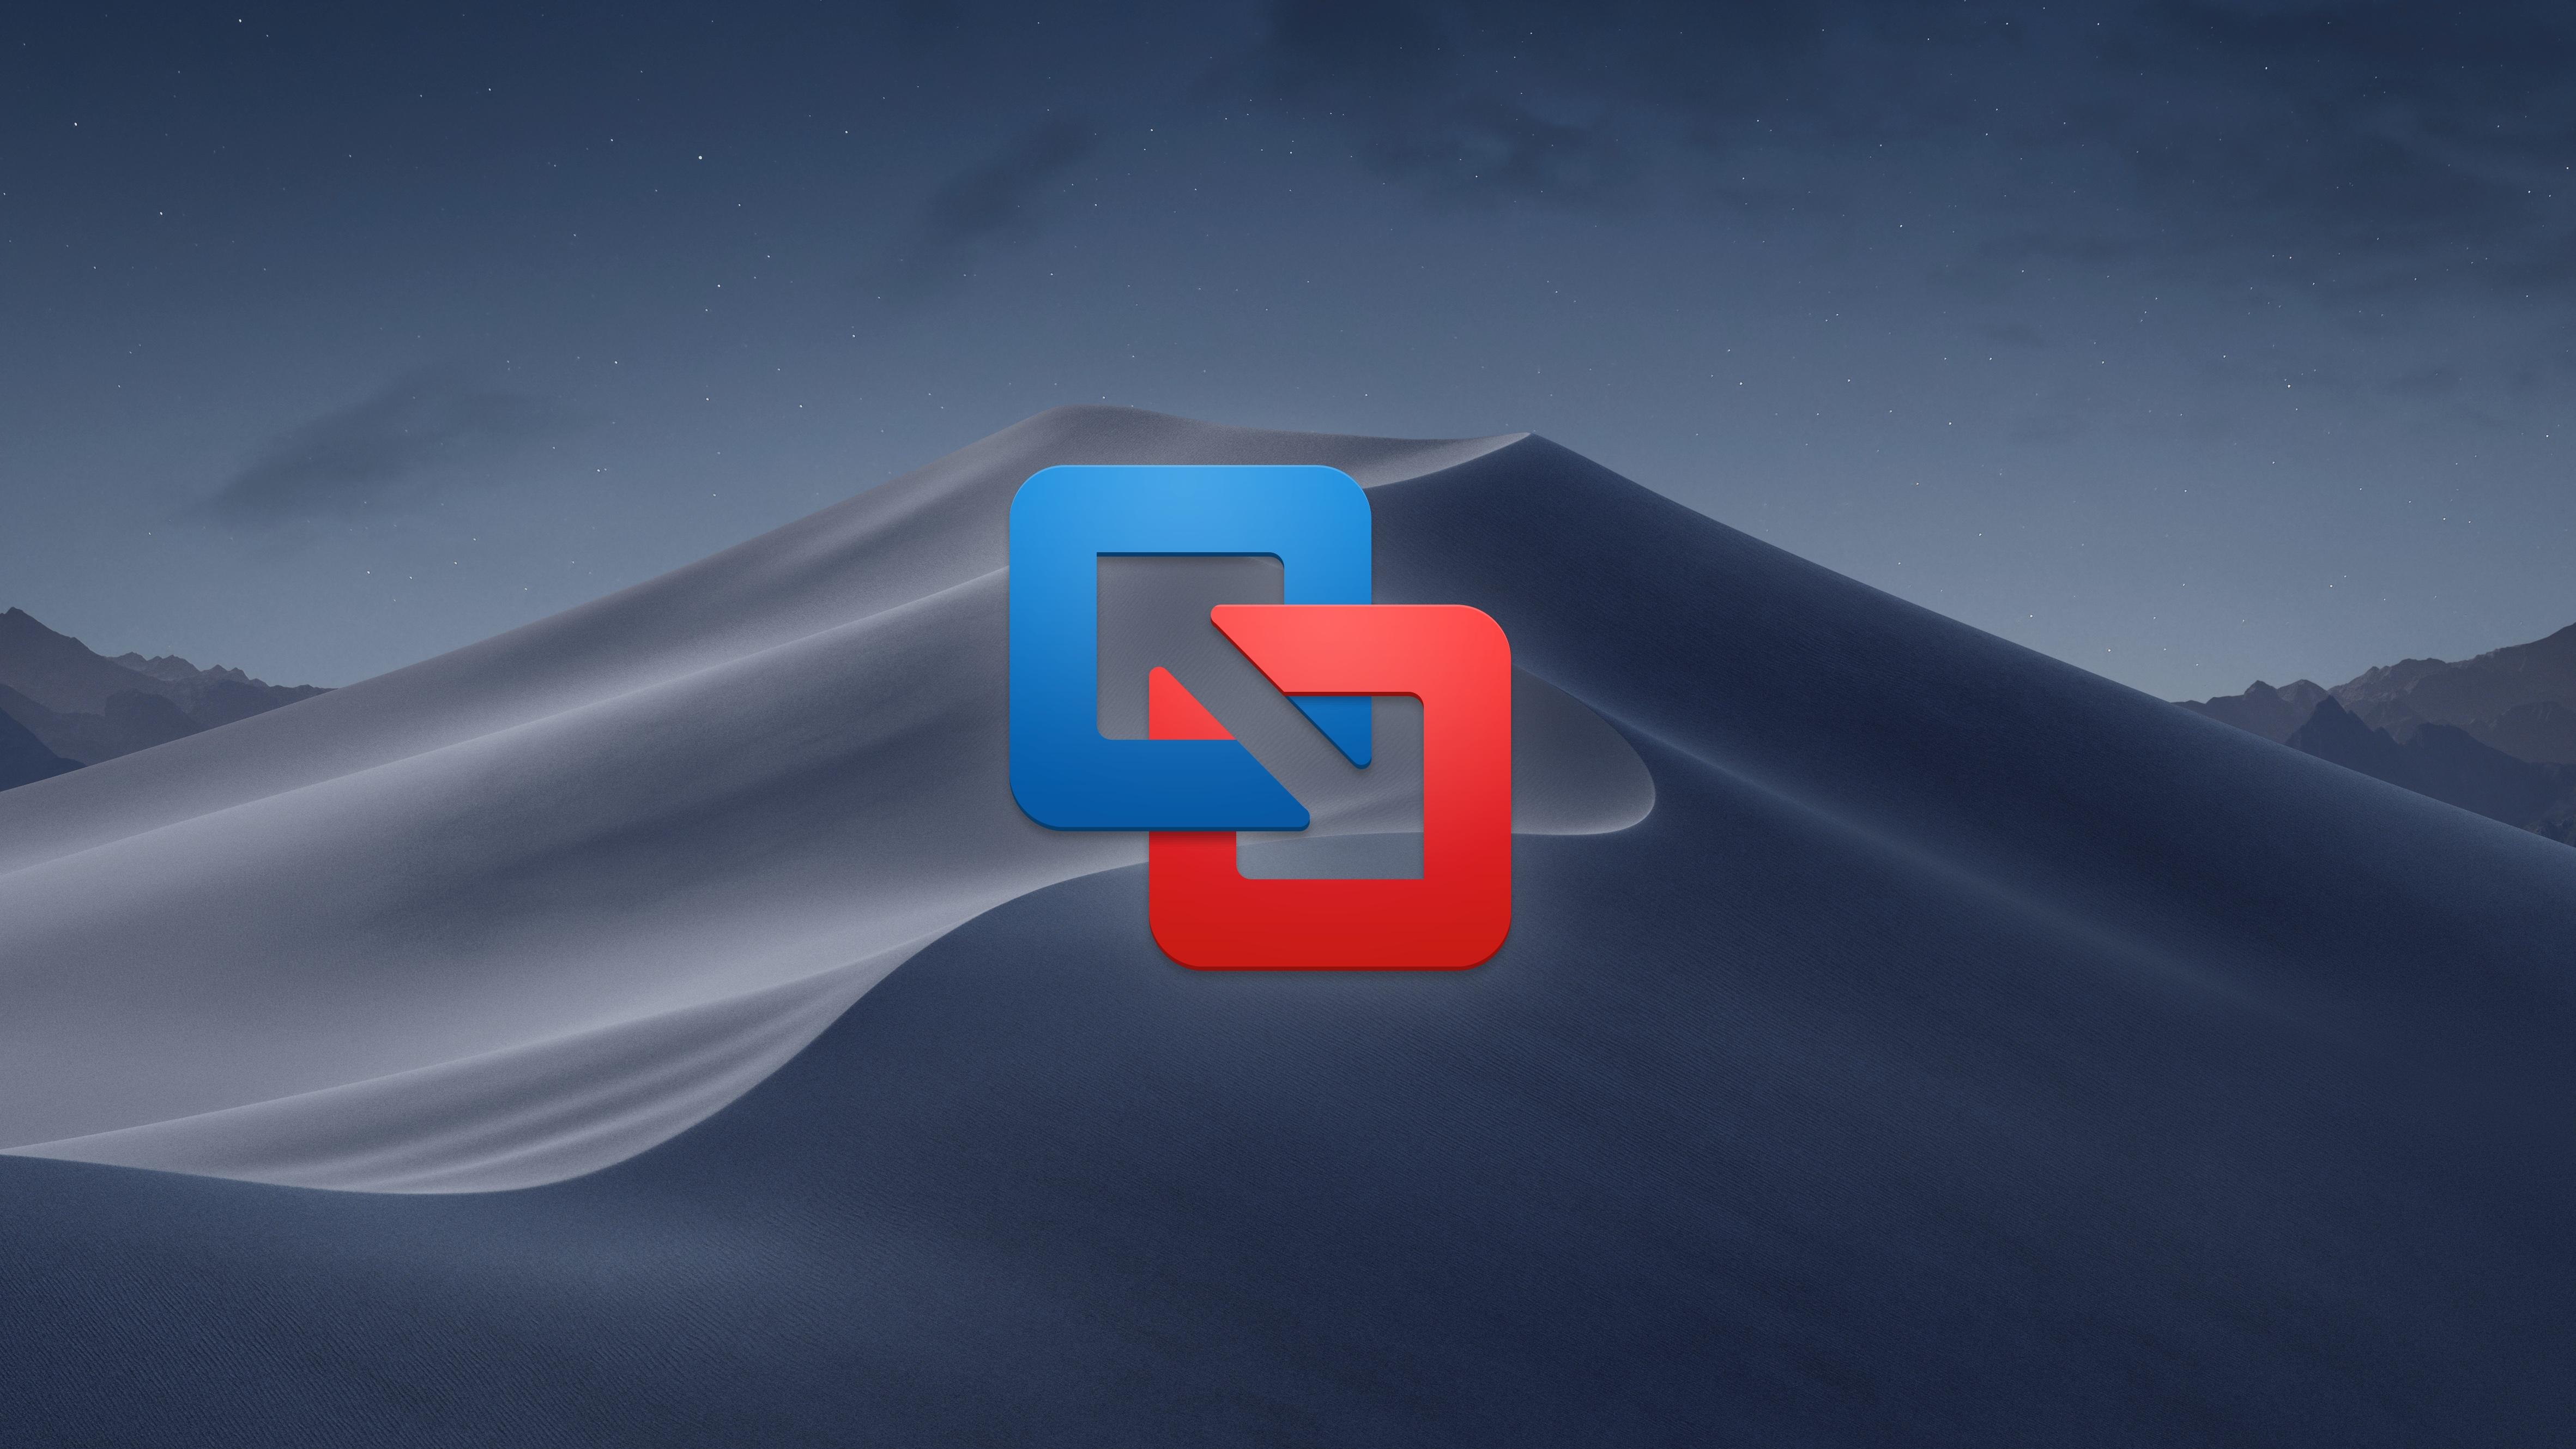 VMware Fusion 11 brengt nieuwe, kleine handigheidjes » One More Thing